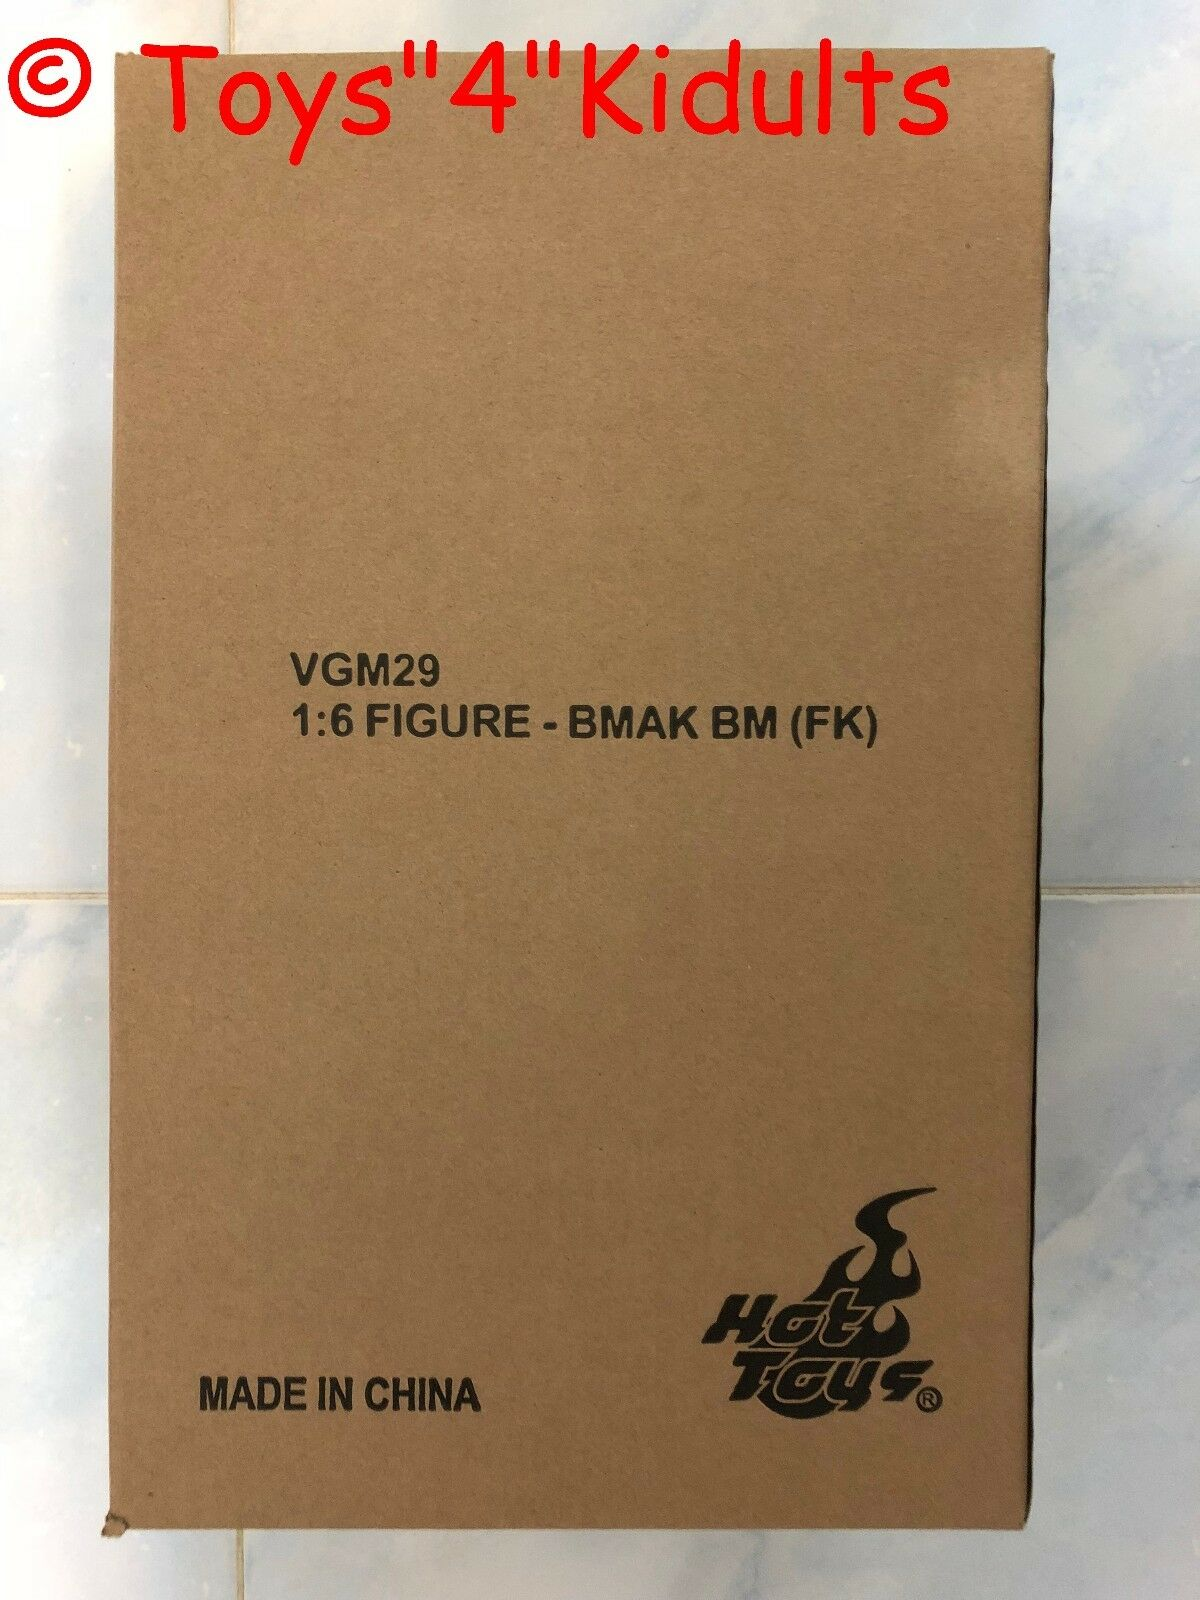 Hot Toys VGM 29 Batman Arkham Knight (Futura Knight Version) 12 in (environ 30.48 cm) FIGURE NEW